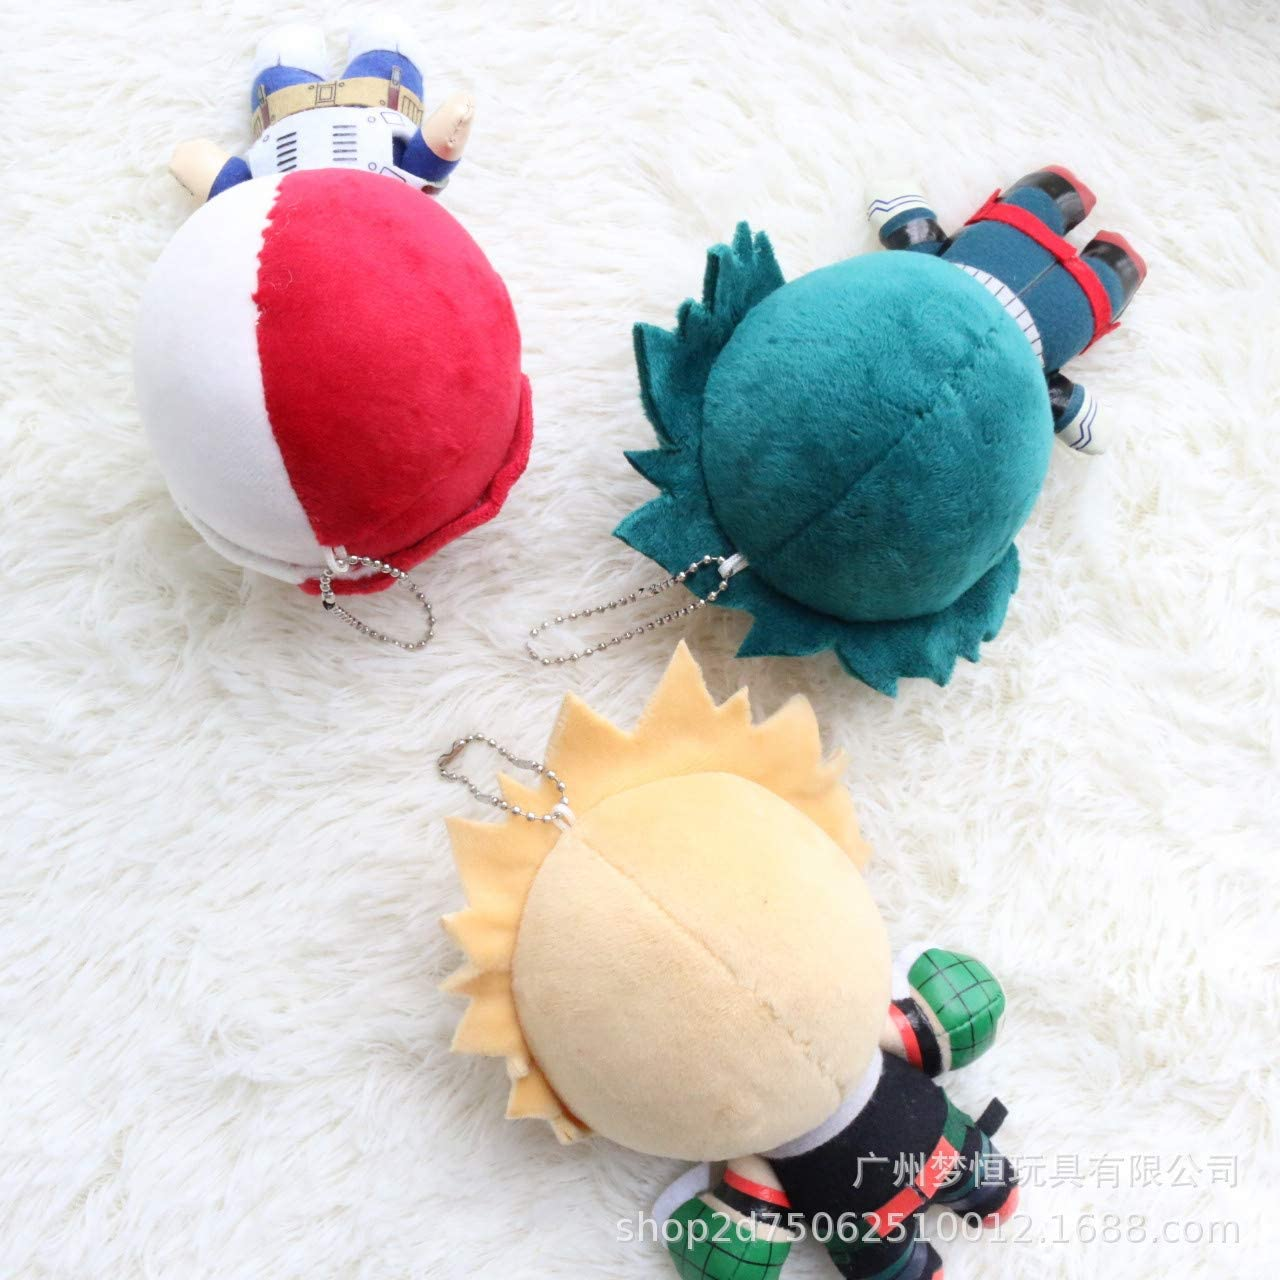 Anime My Hero Academia Bakugo Izuku Todoroki Plush Doll Toy Keychain Charm